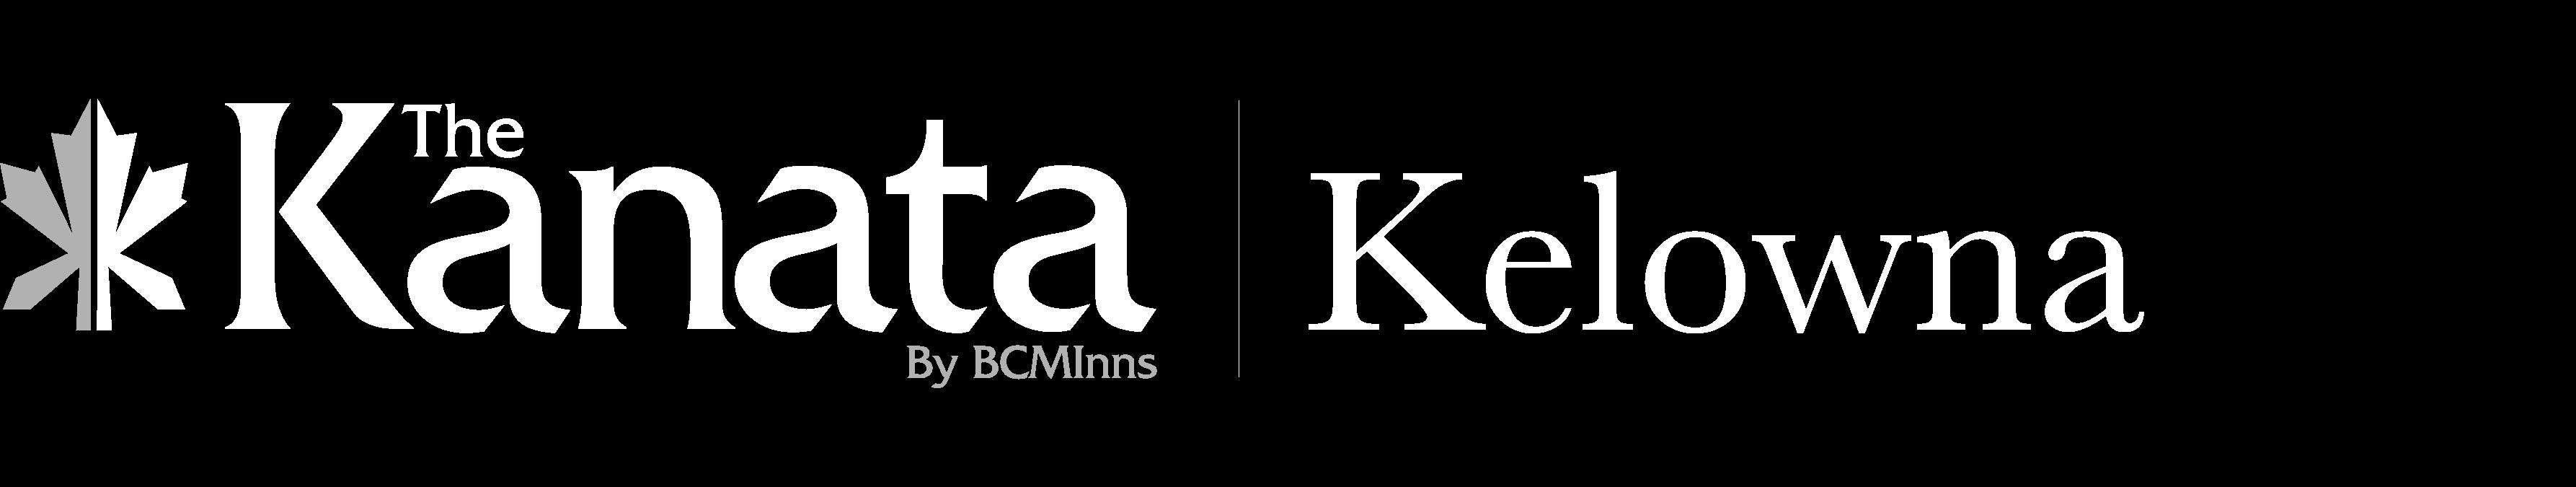 kanata hotels in kelowna logo